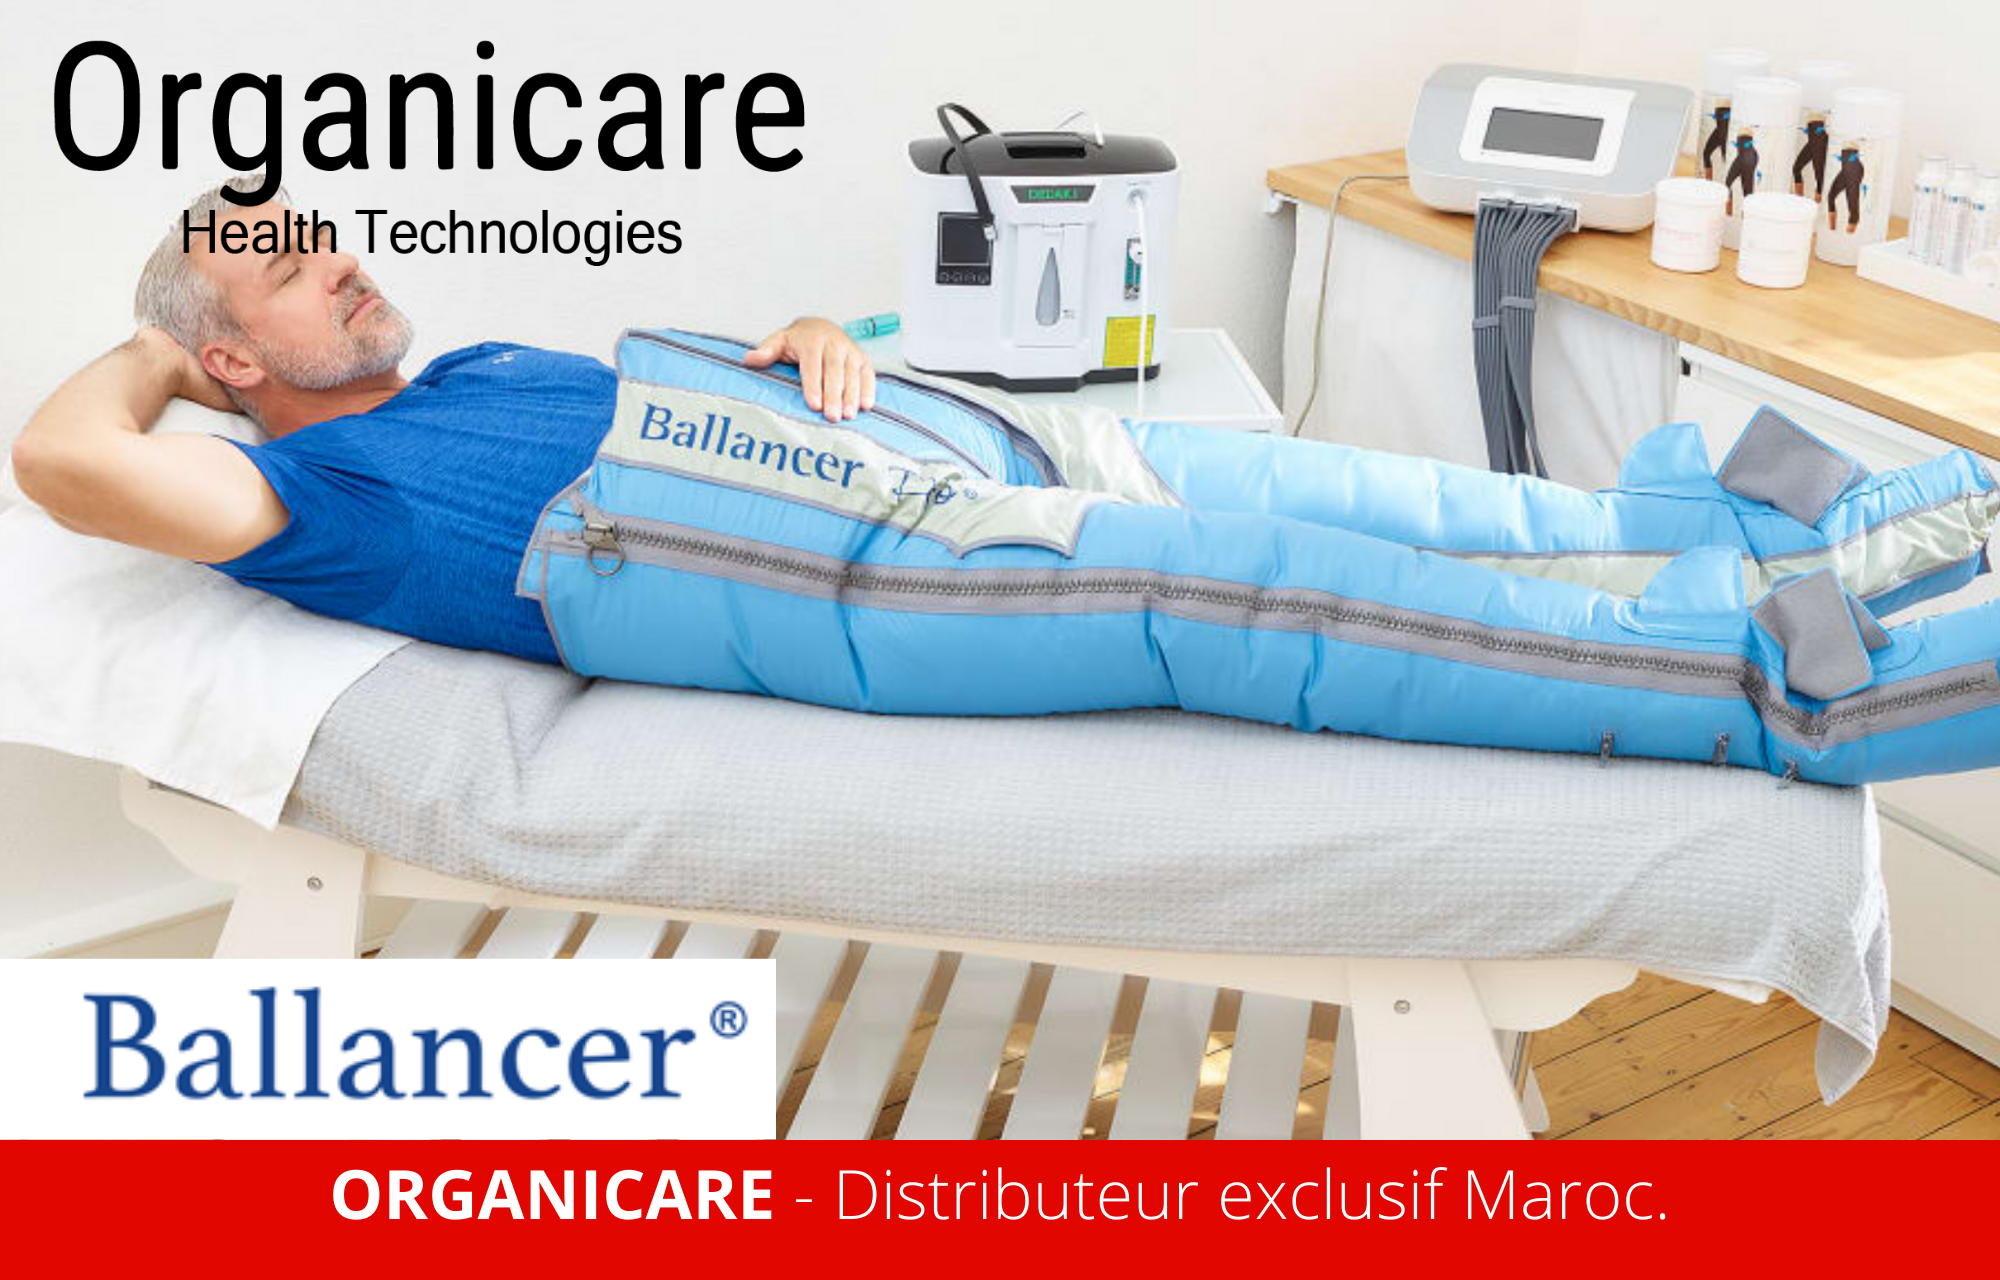 pressotherapie ballancer Distributeur exclusif Maroc.